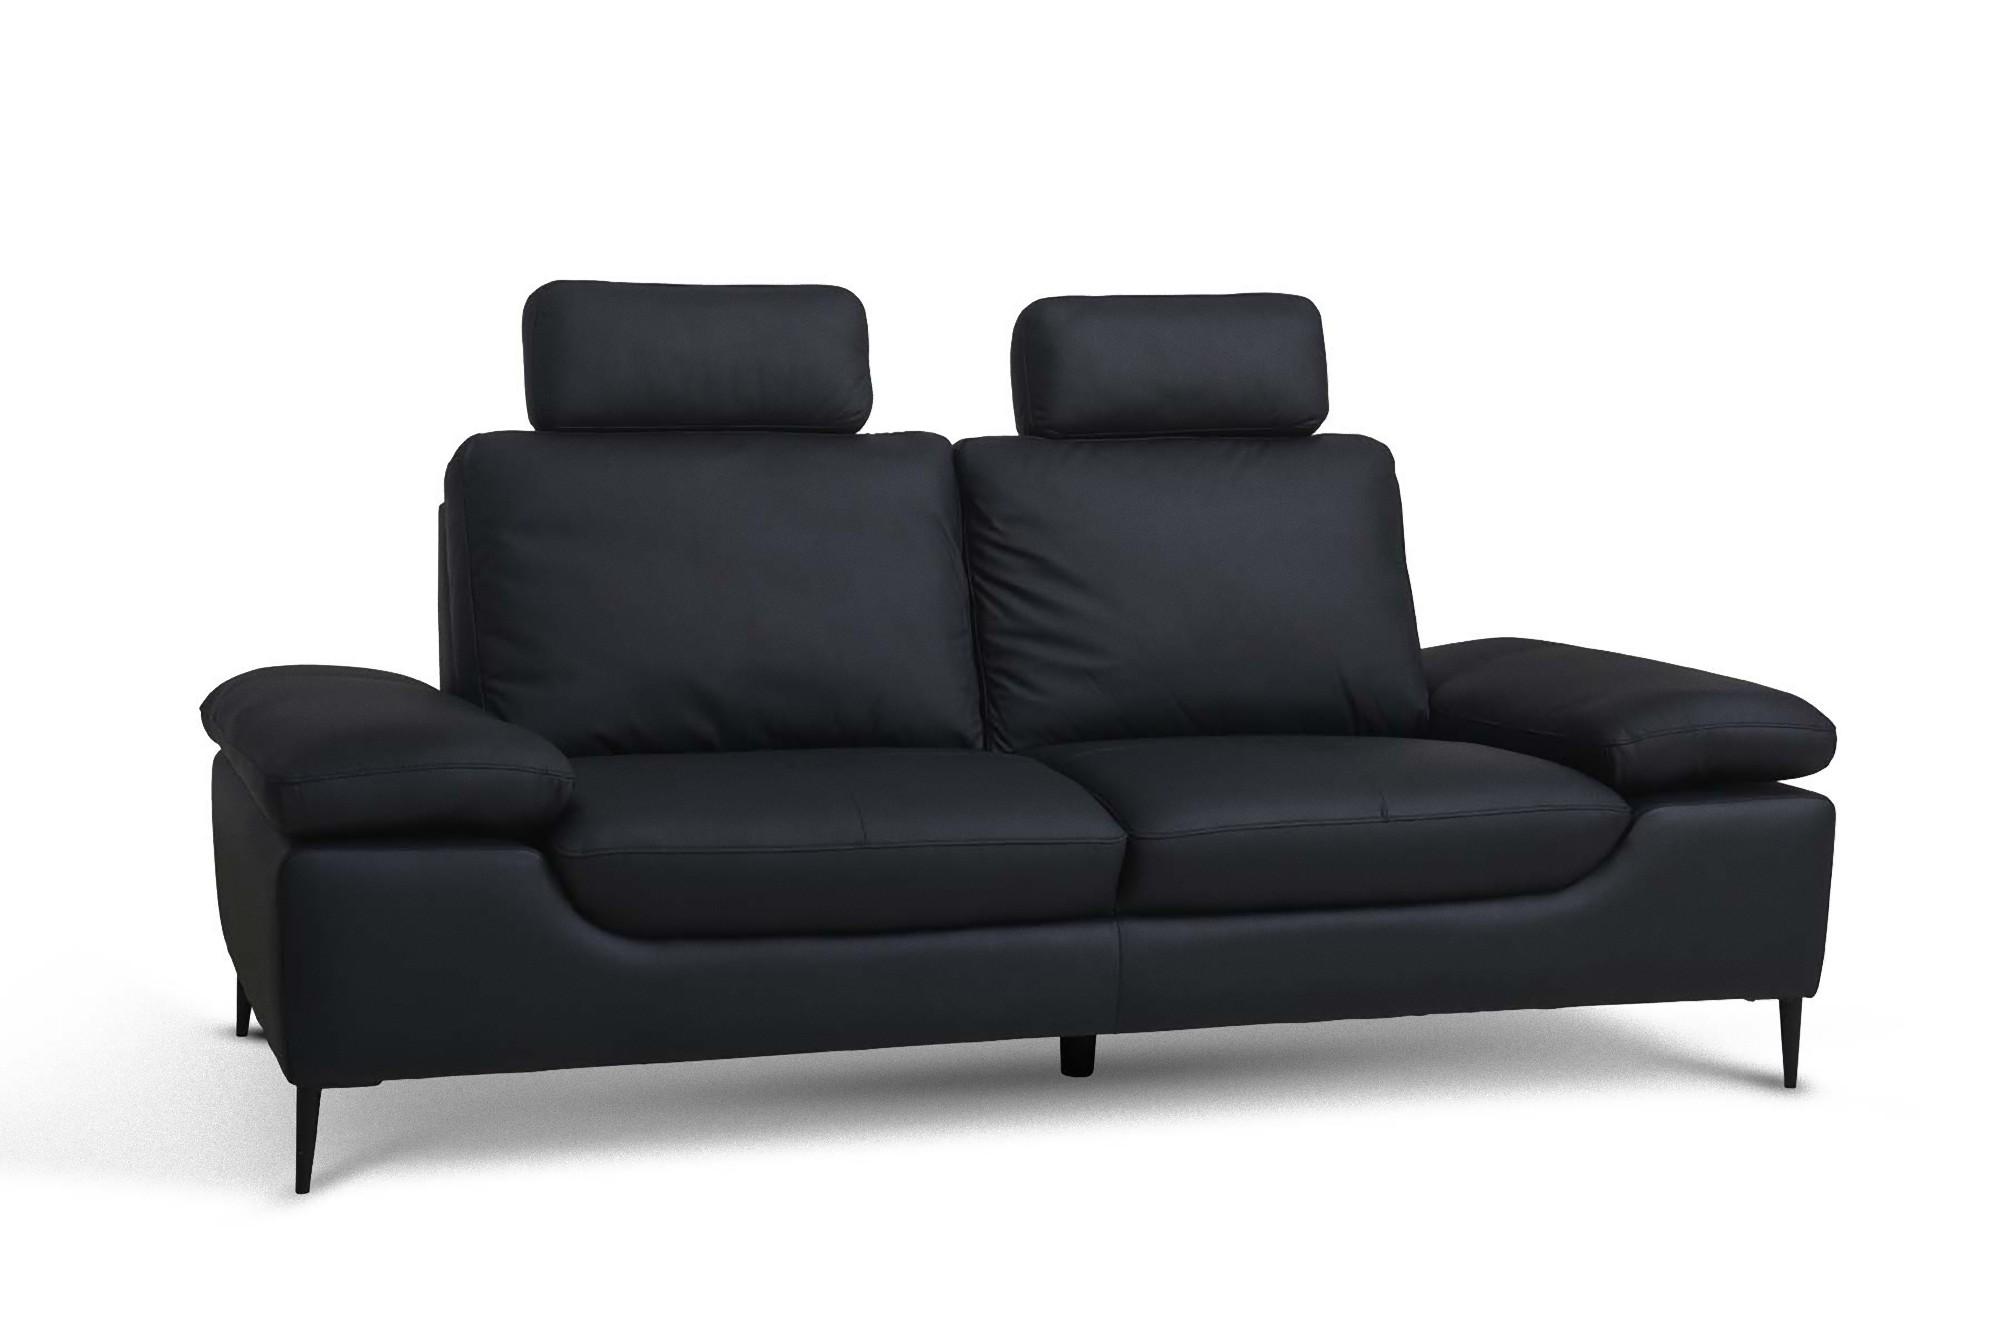 Echtleder Sofa Vita 3 Sitzer Couch Ledersofa Loungesofa Wohnzimmer schwarz  | dynamic-24.de